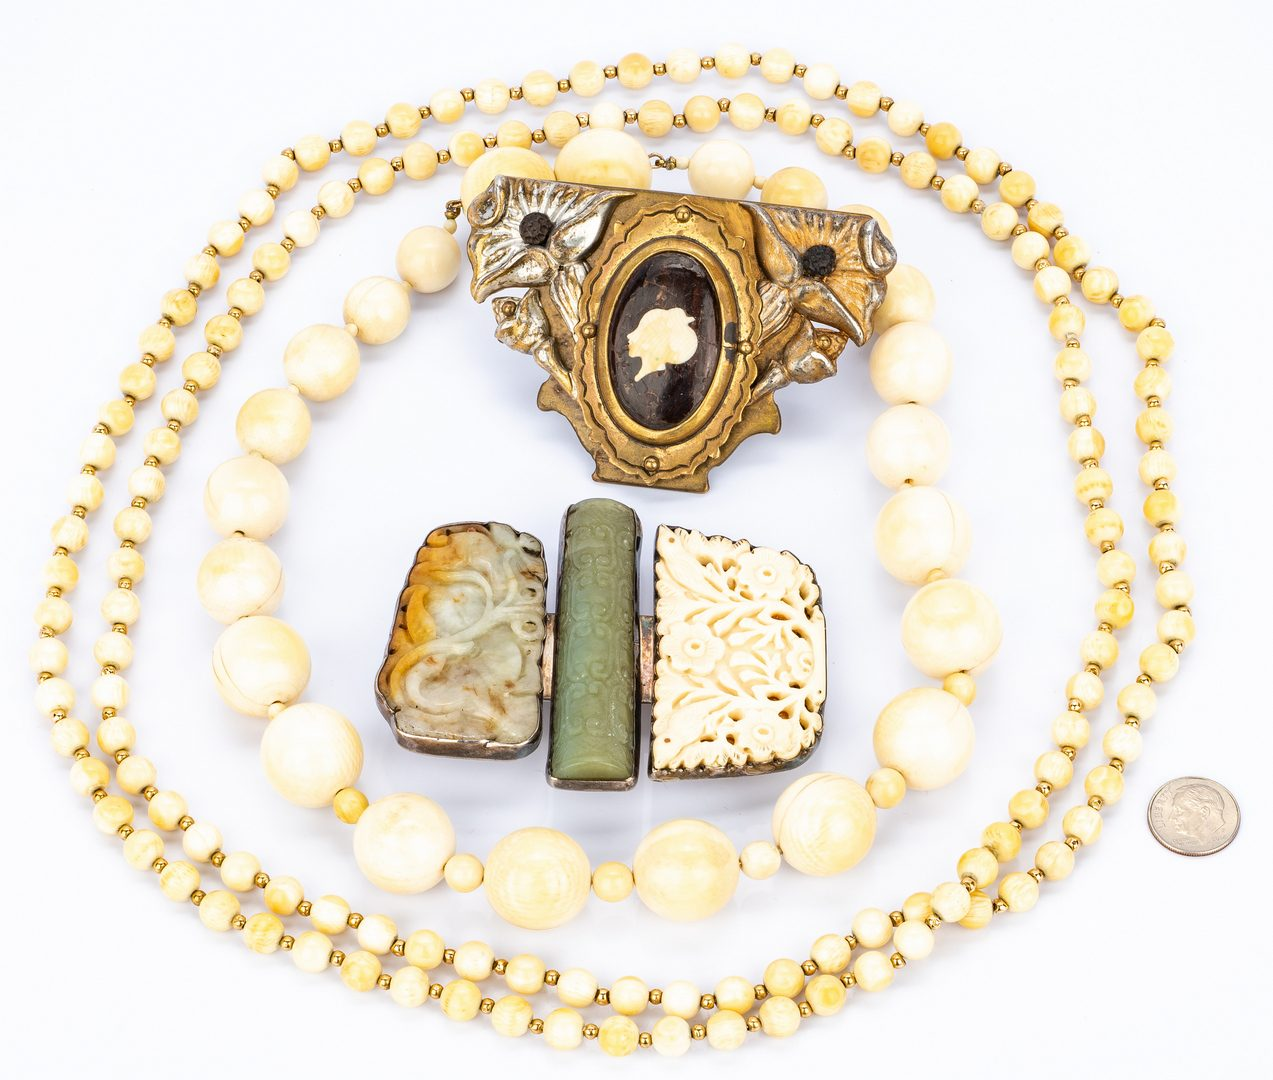 Lot 429: 2 Designer Buckles w/ 2 Necklaces, 4 items